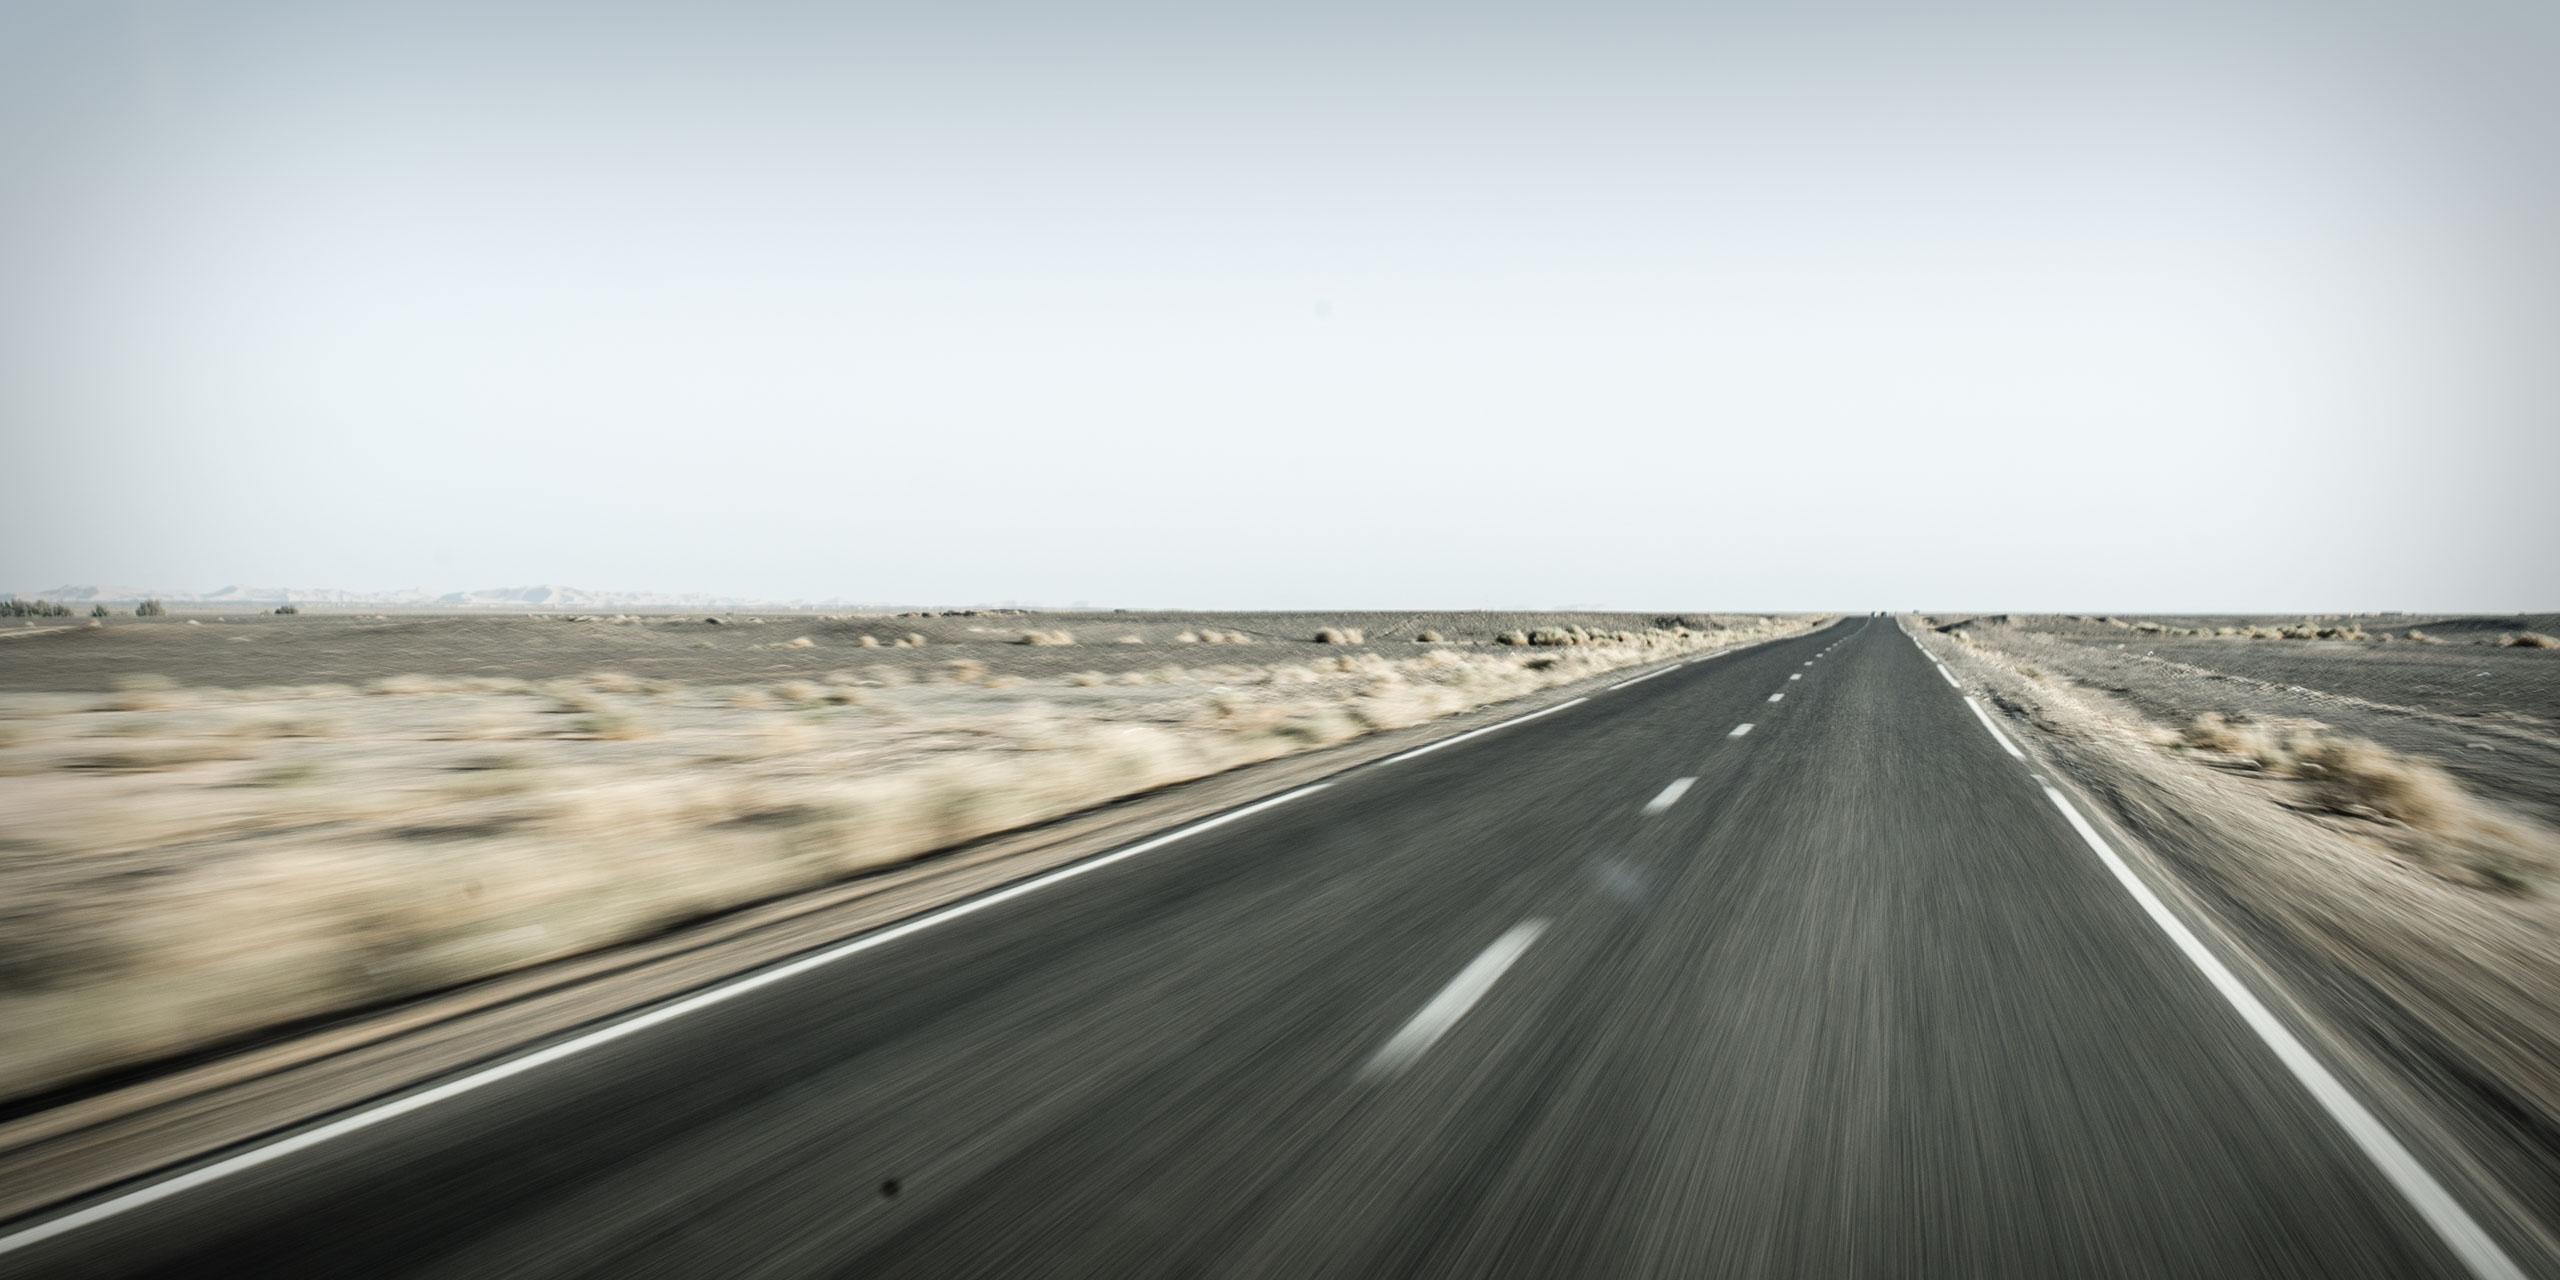 Entlang der Wüstenstraße